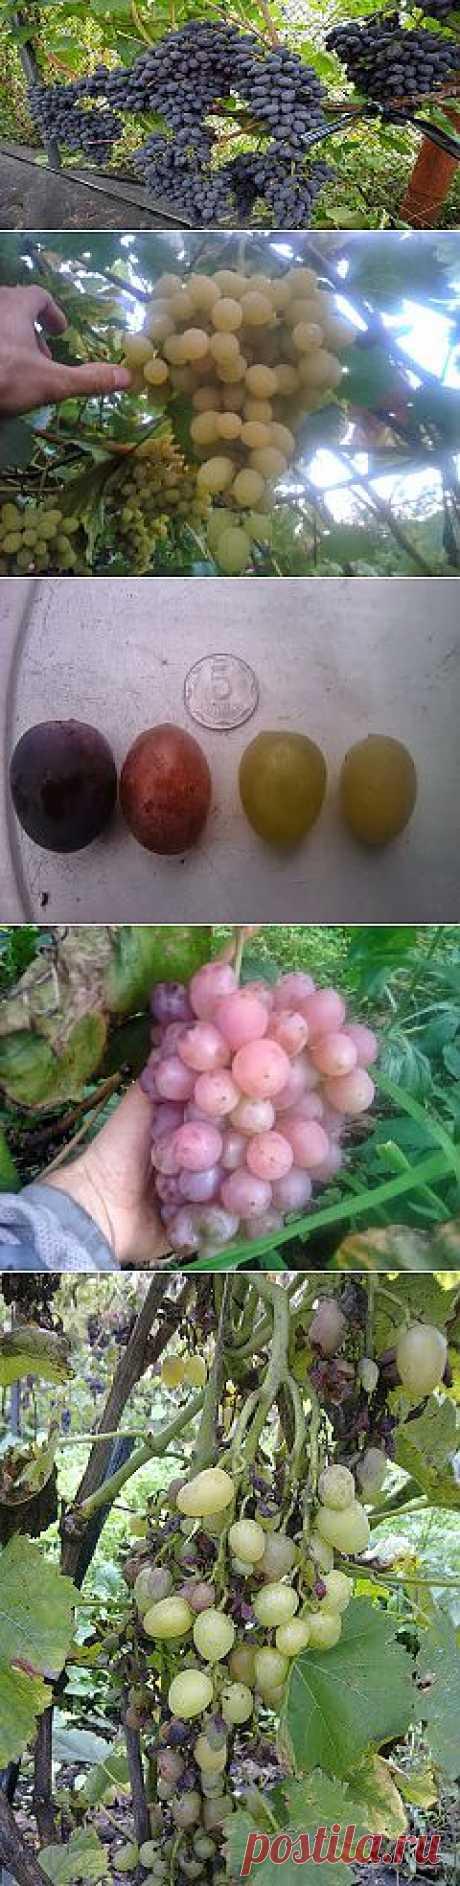 Блог про виноград Киушкина Николая